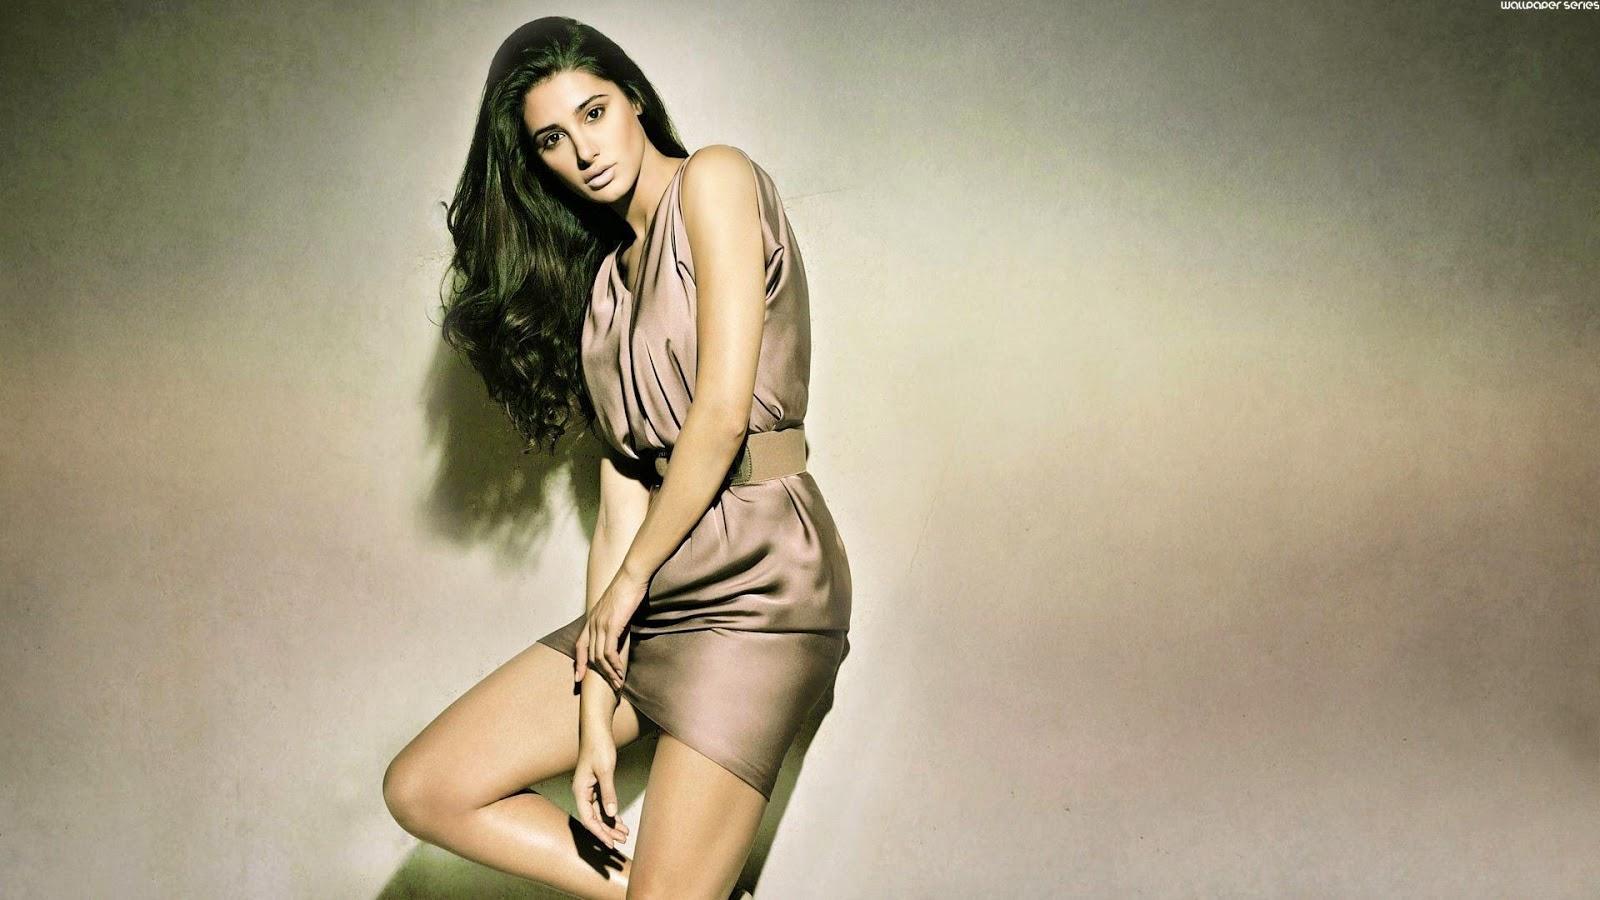 HD Nargis Fakhri Photoshoot Wallpapers